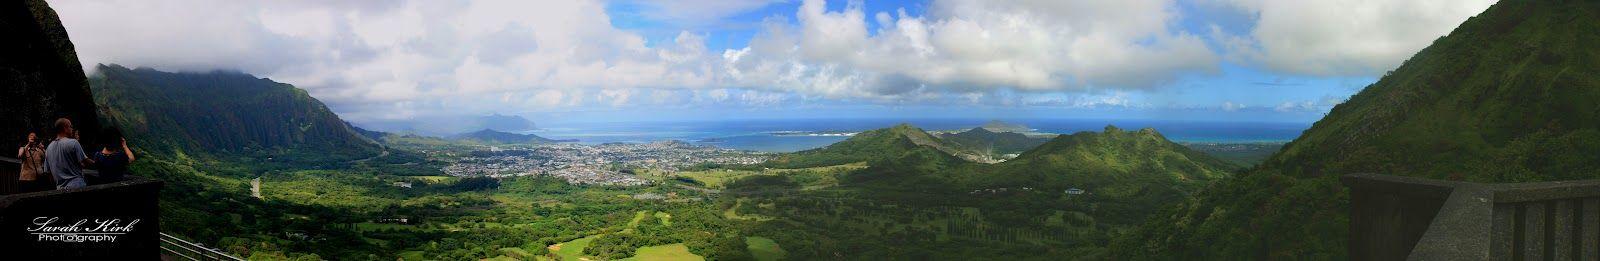 Hawaii Pali overlook Natural landmarks, Pali, Best